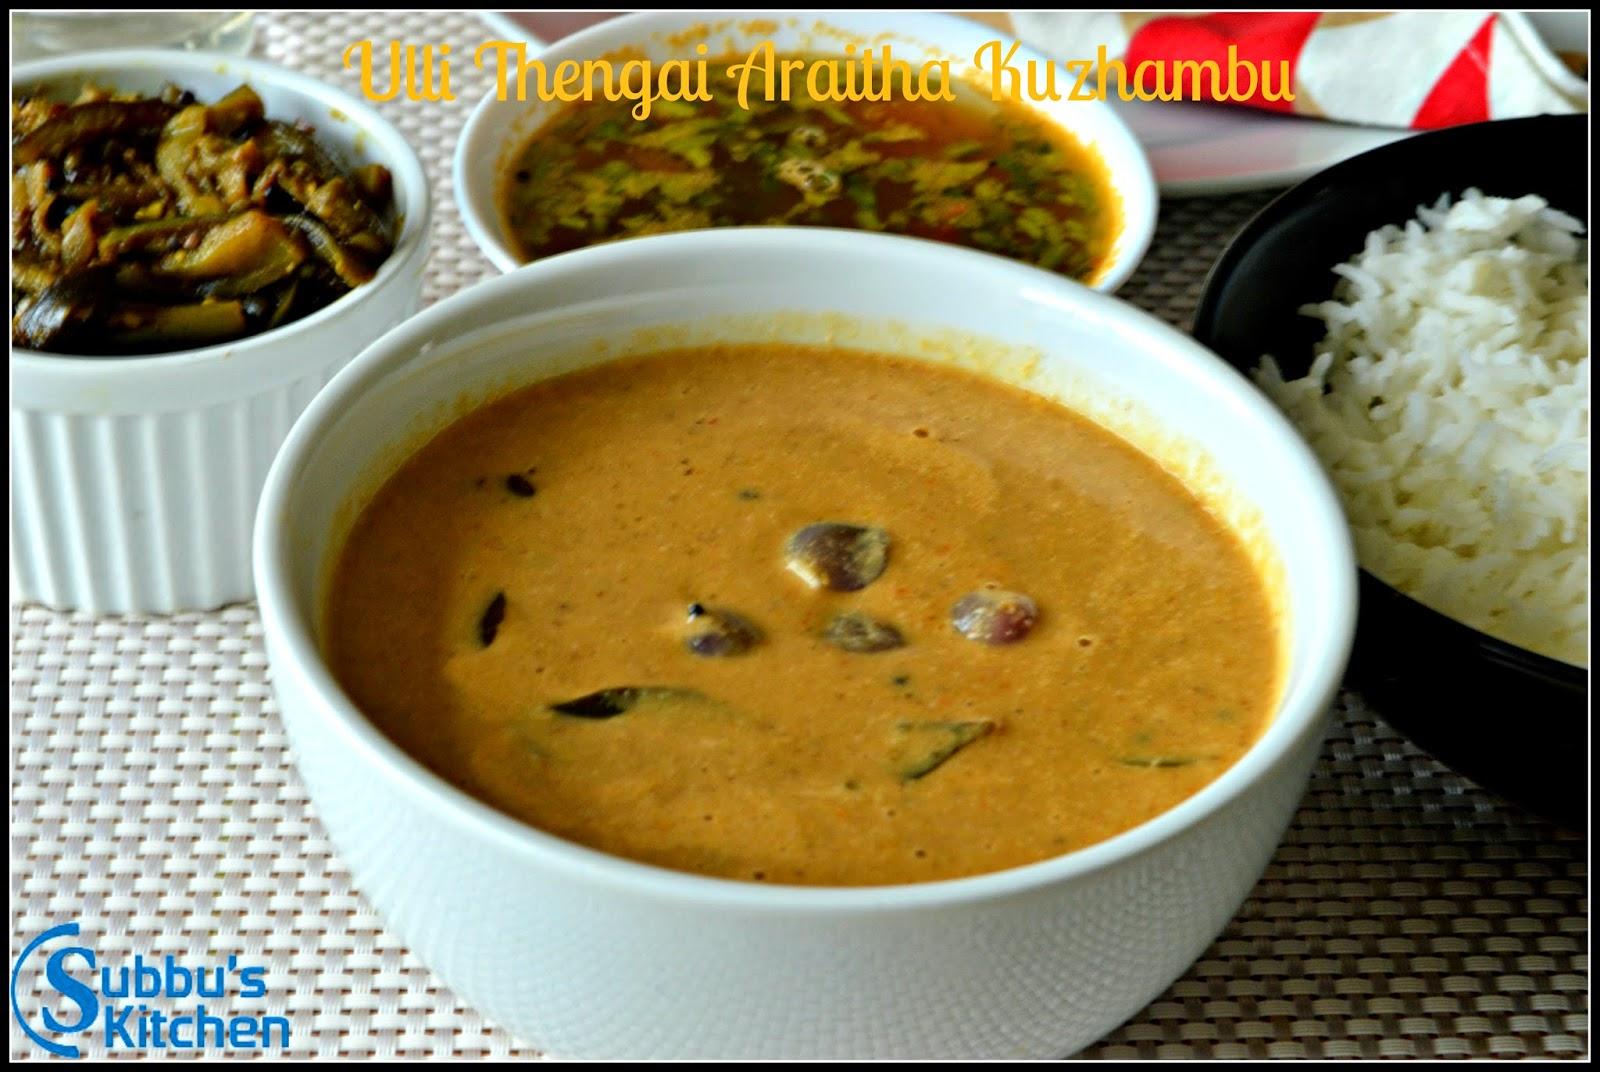 Ulli Thengai Araitha kuzhambu